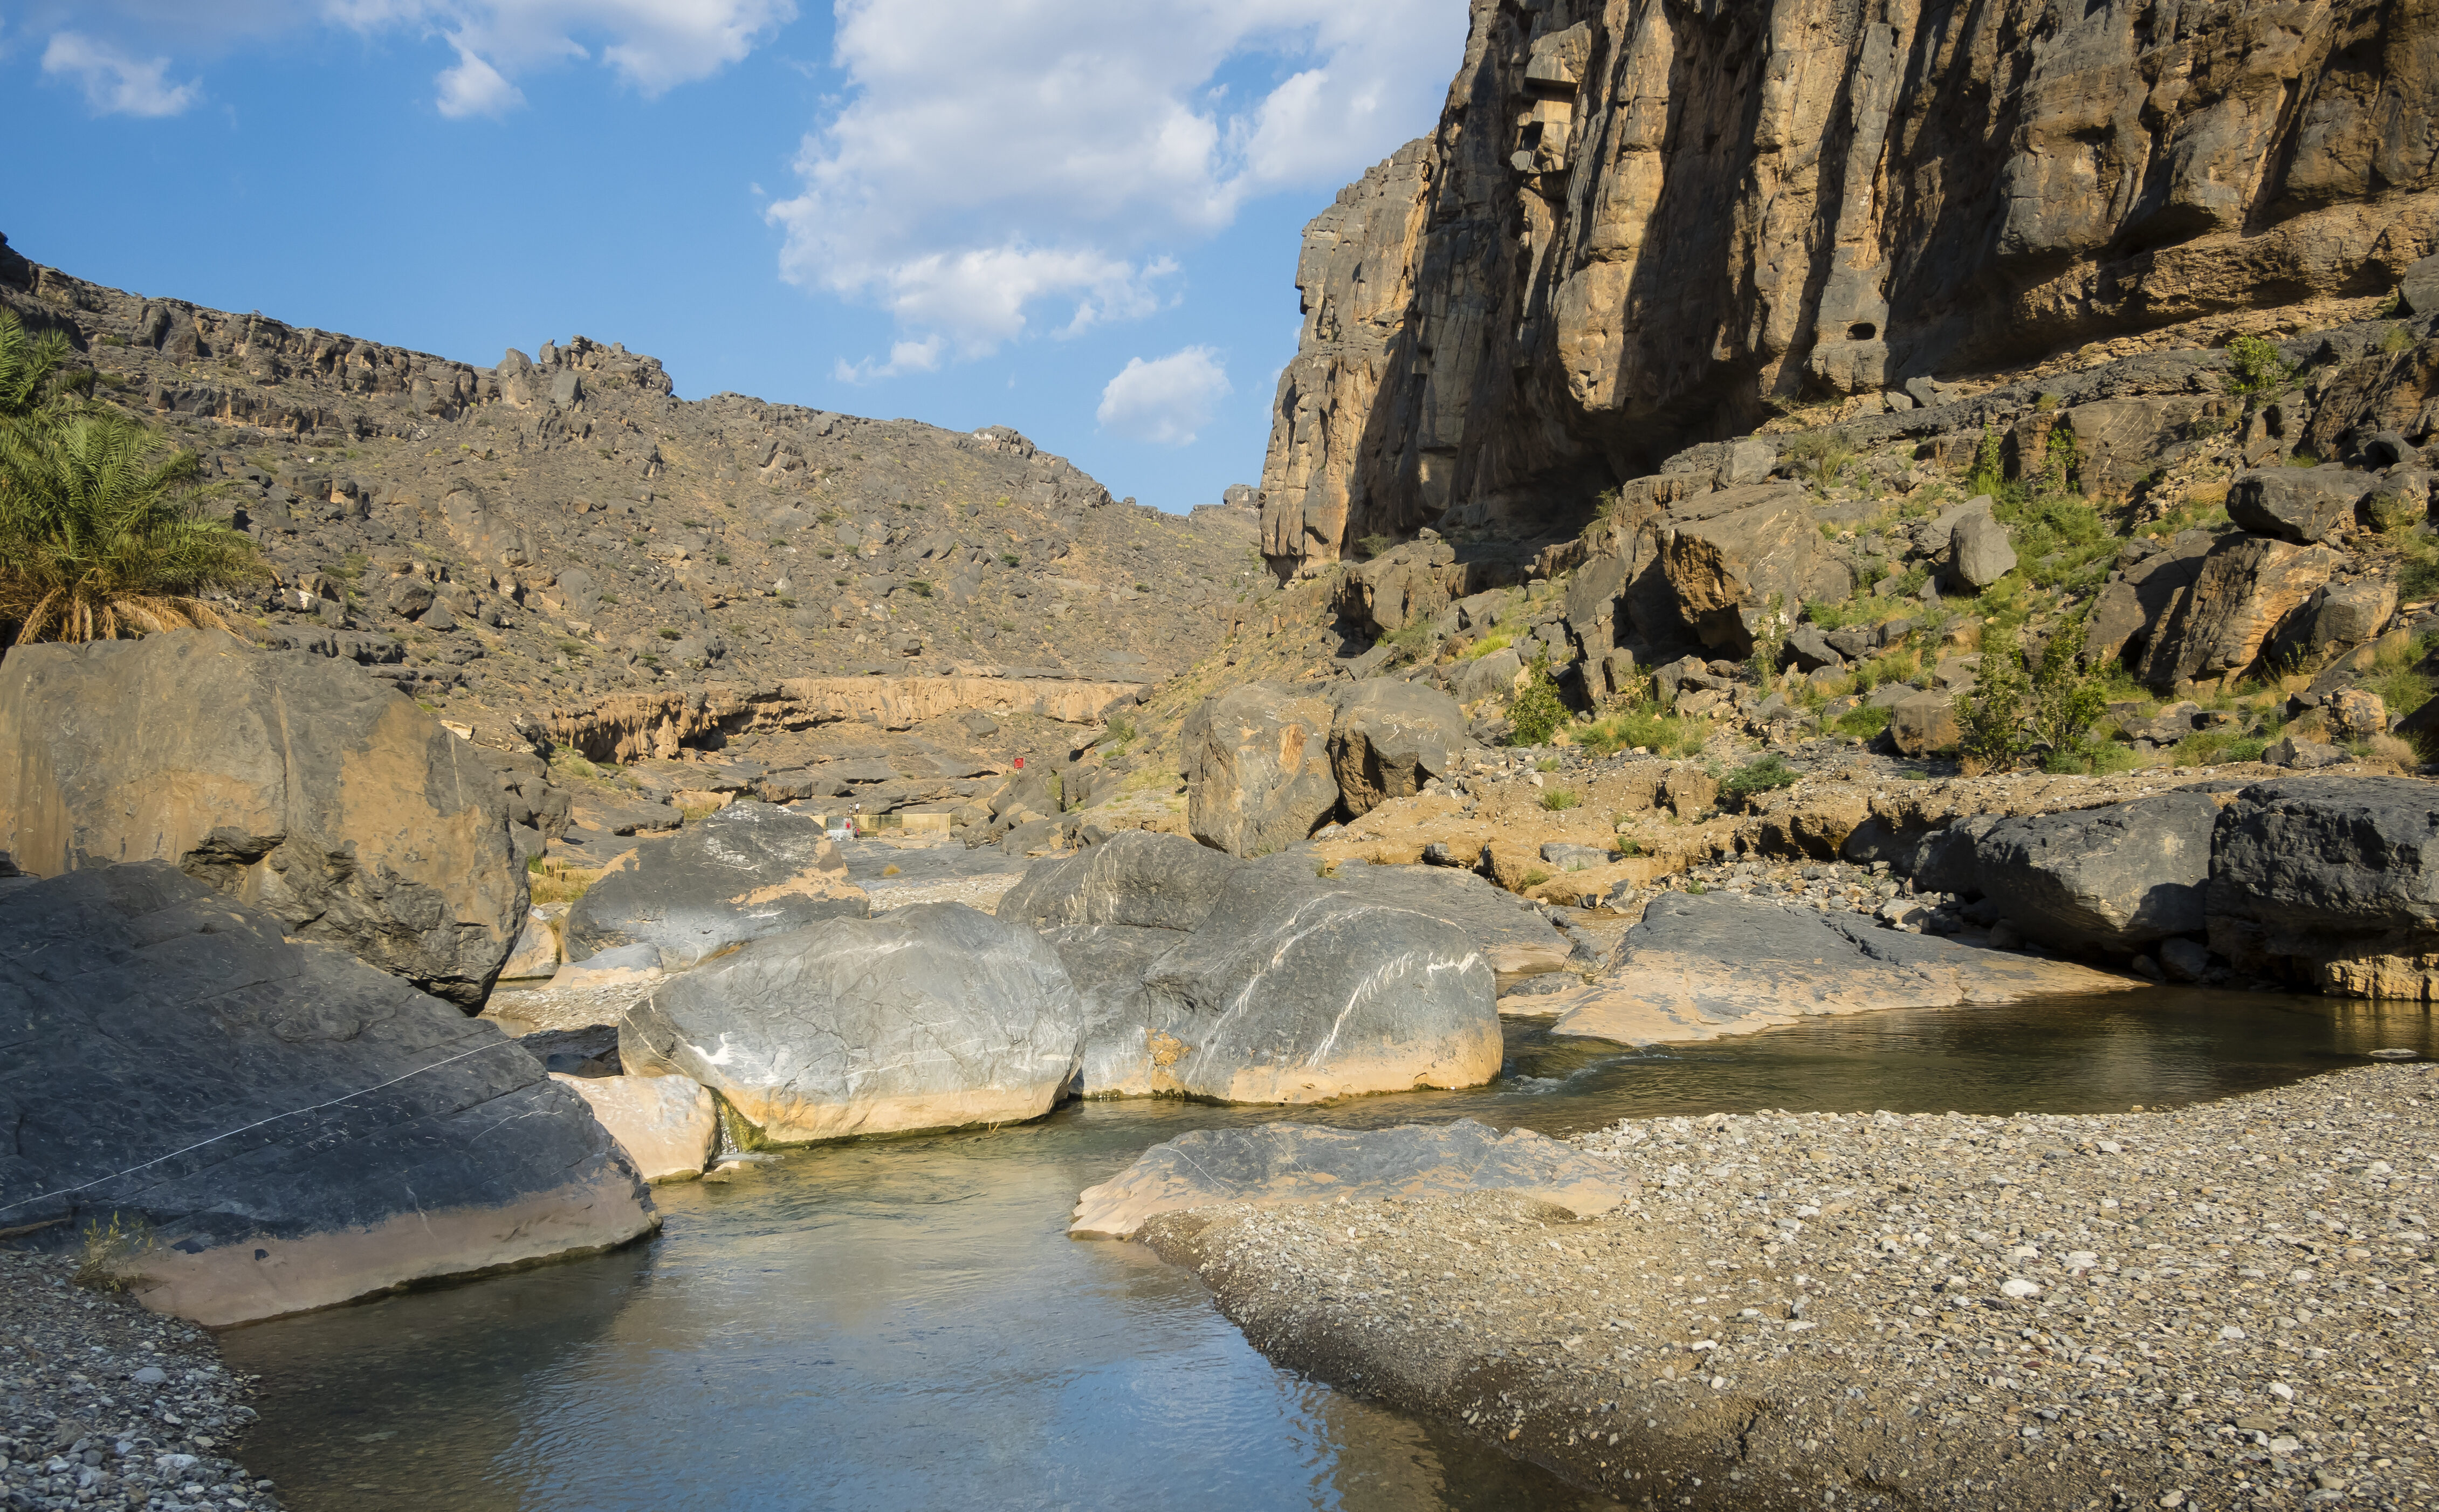 Wadi Damm, Hajar al Gharbi Berge, Al Dhahirah Region Oman